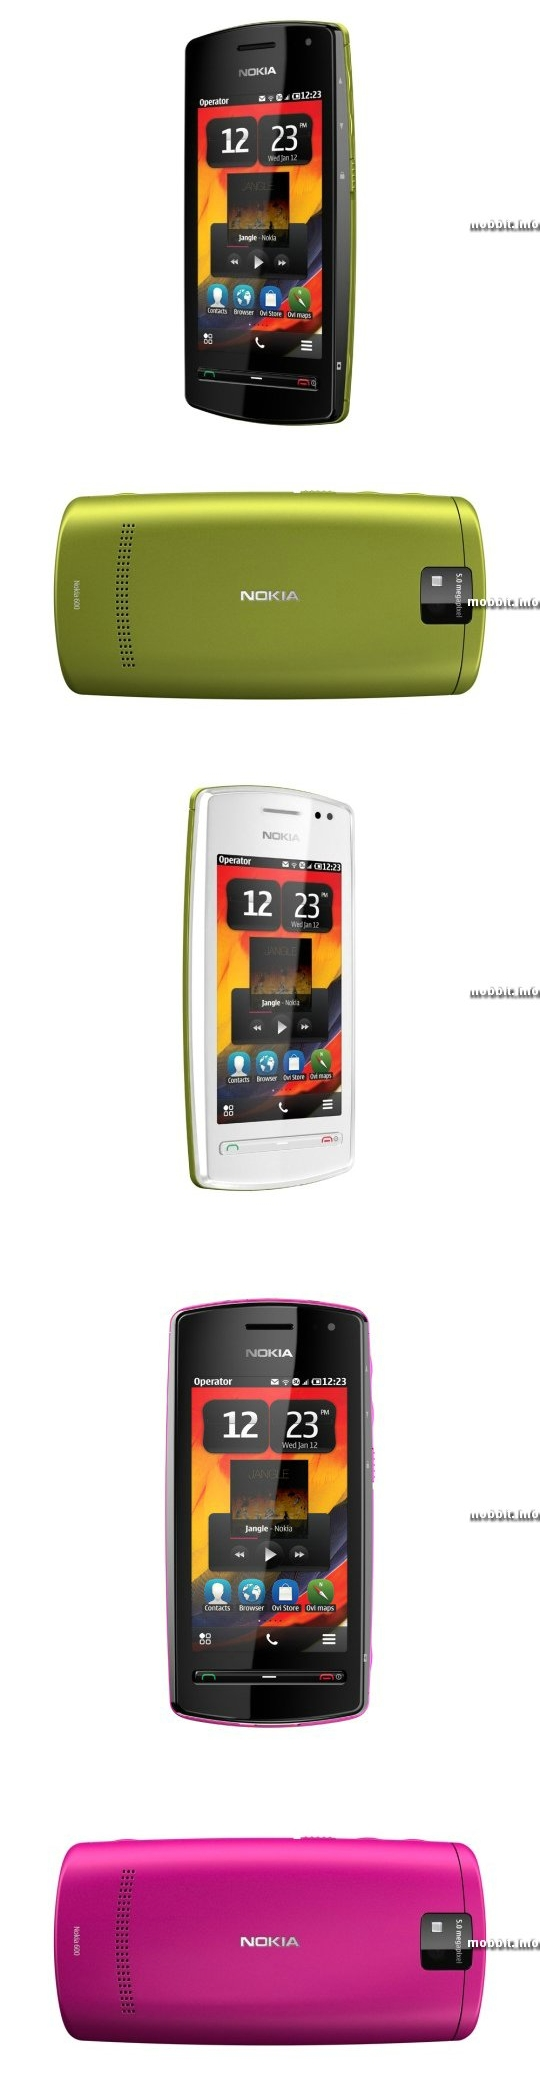 Nokia 600 (Cindy)